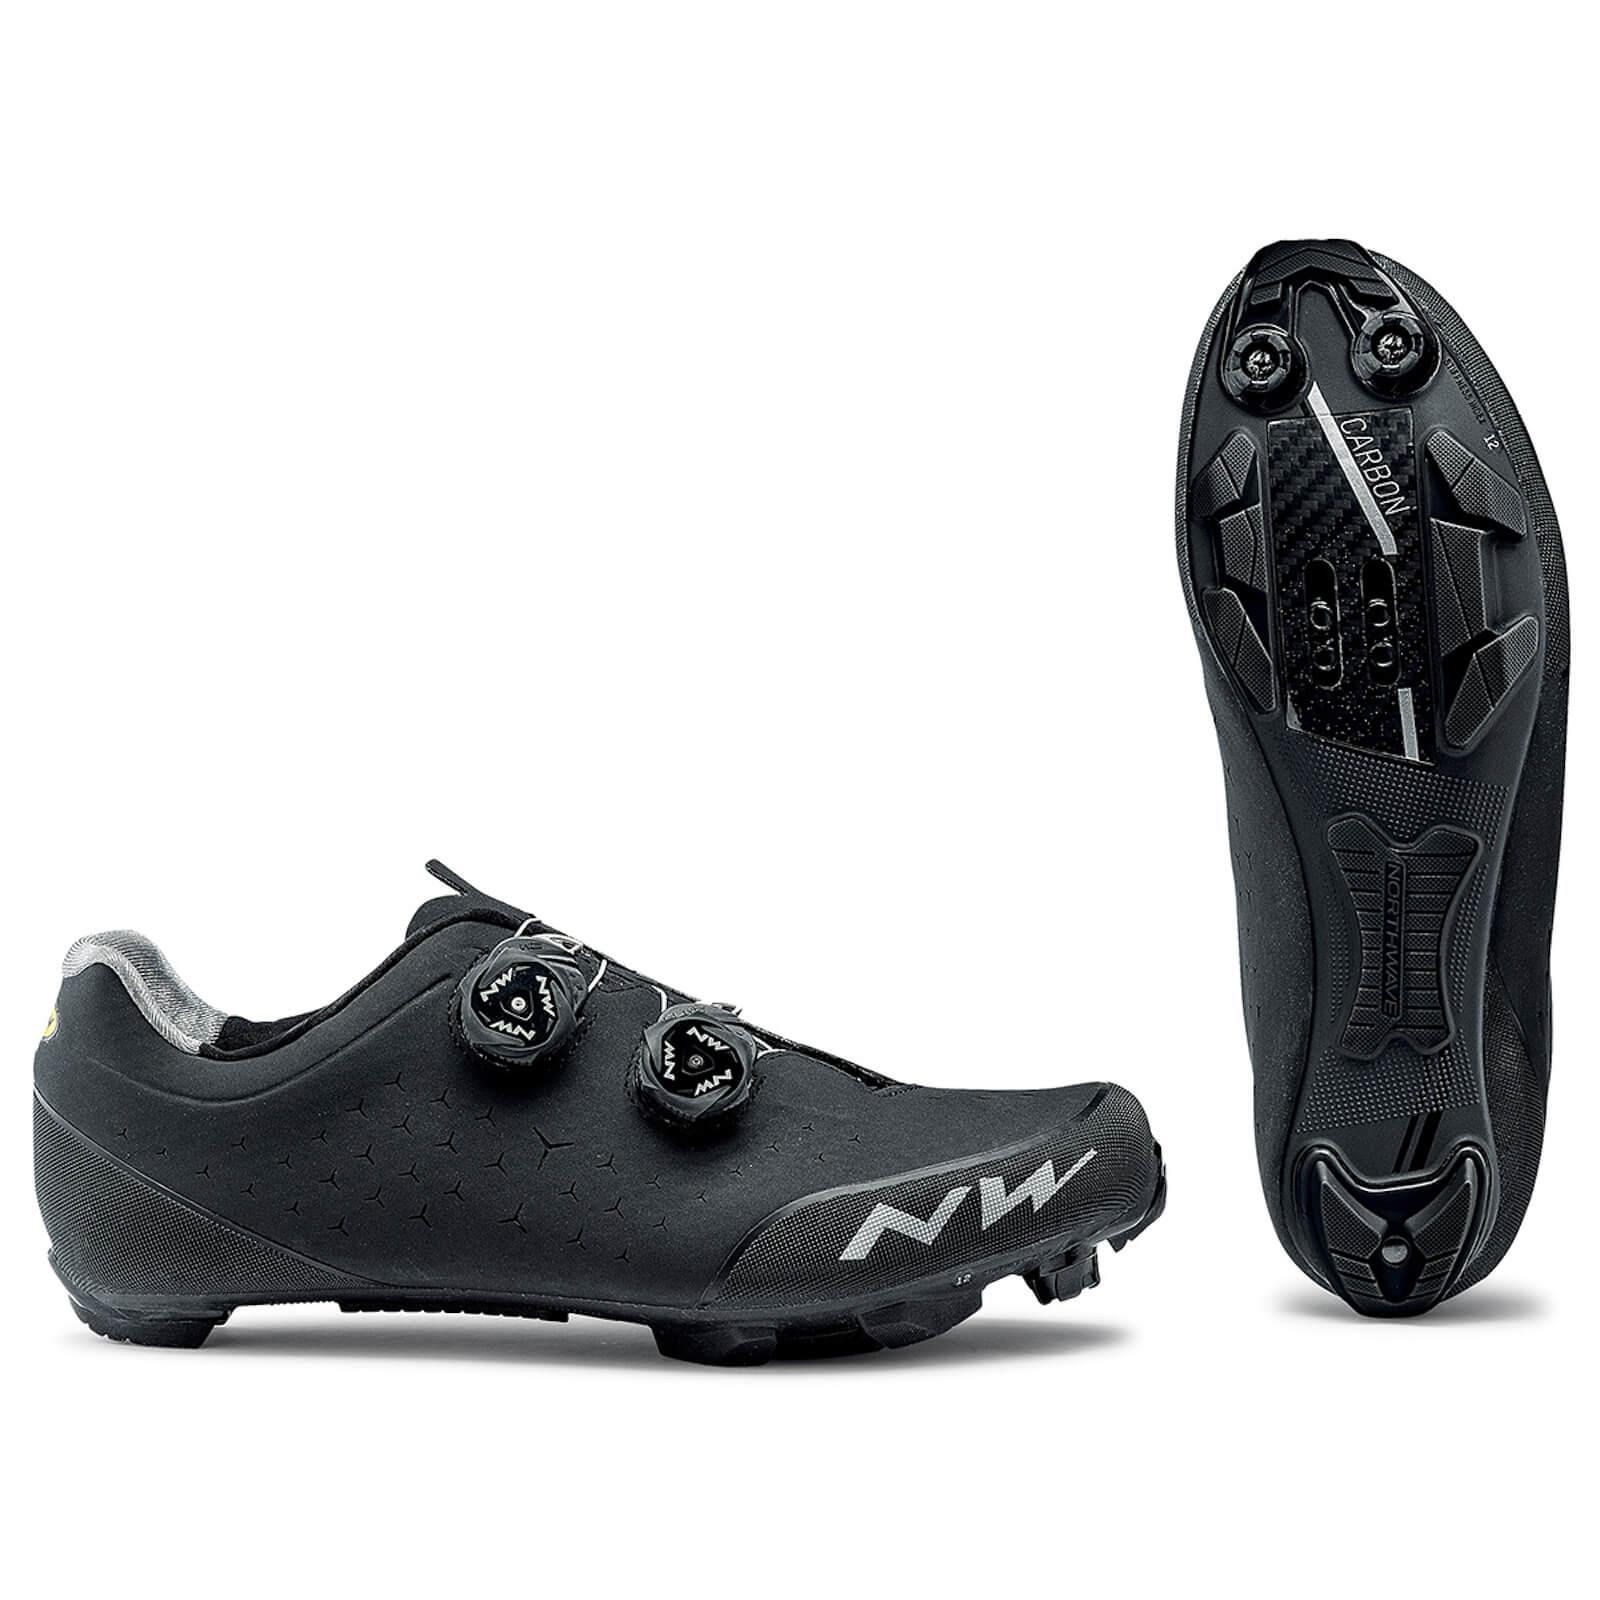 Northwave Rebel 2 MTB Shoes - EU41 - Antra/Red